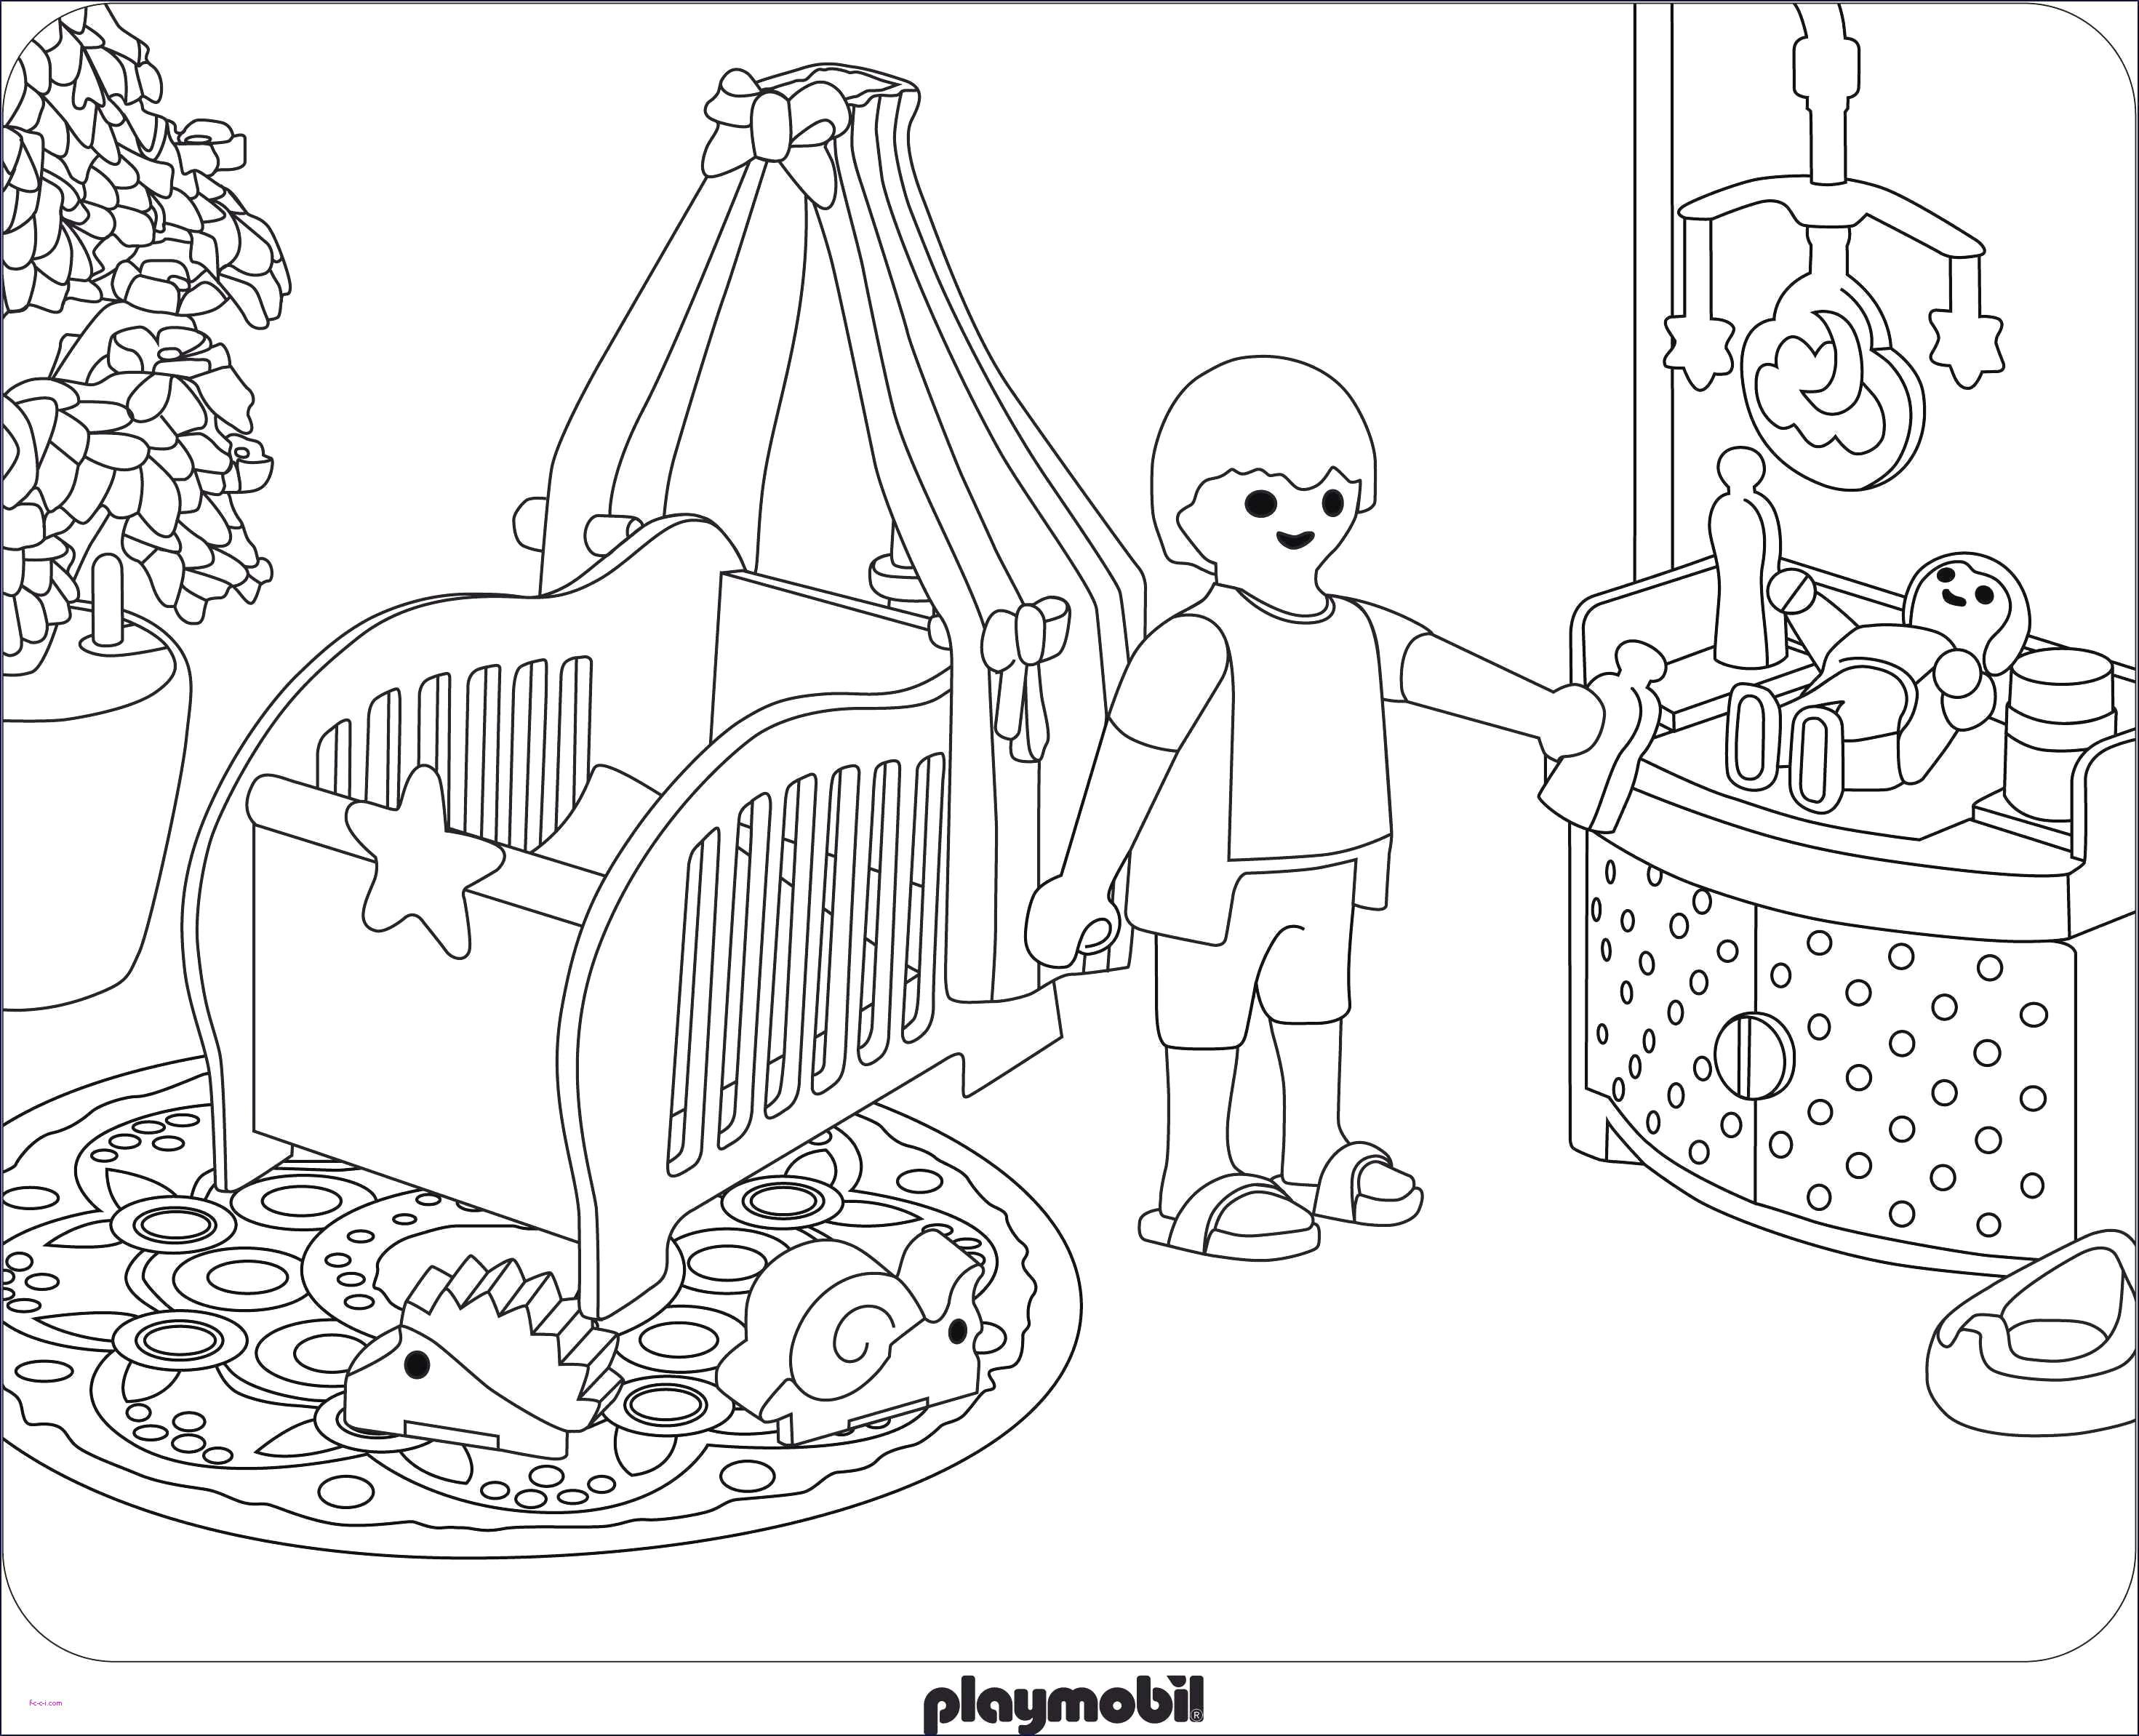 Biene Maja Ausmalbild Inspirierend Kinderzimmer Biene Maja Und 32 Malvorlagen Playmobil Scoredatscore Galerie